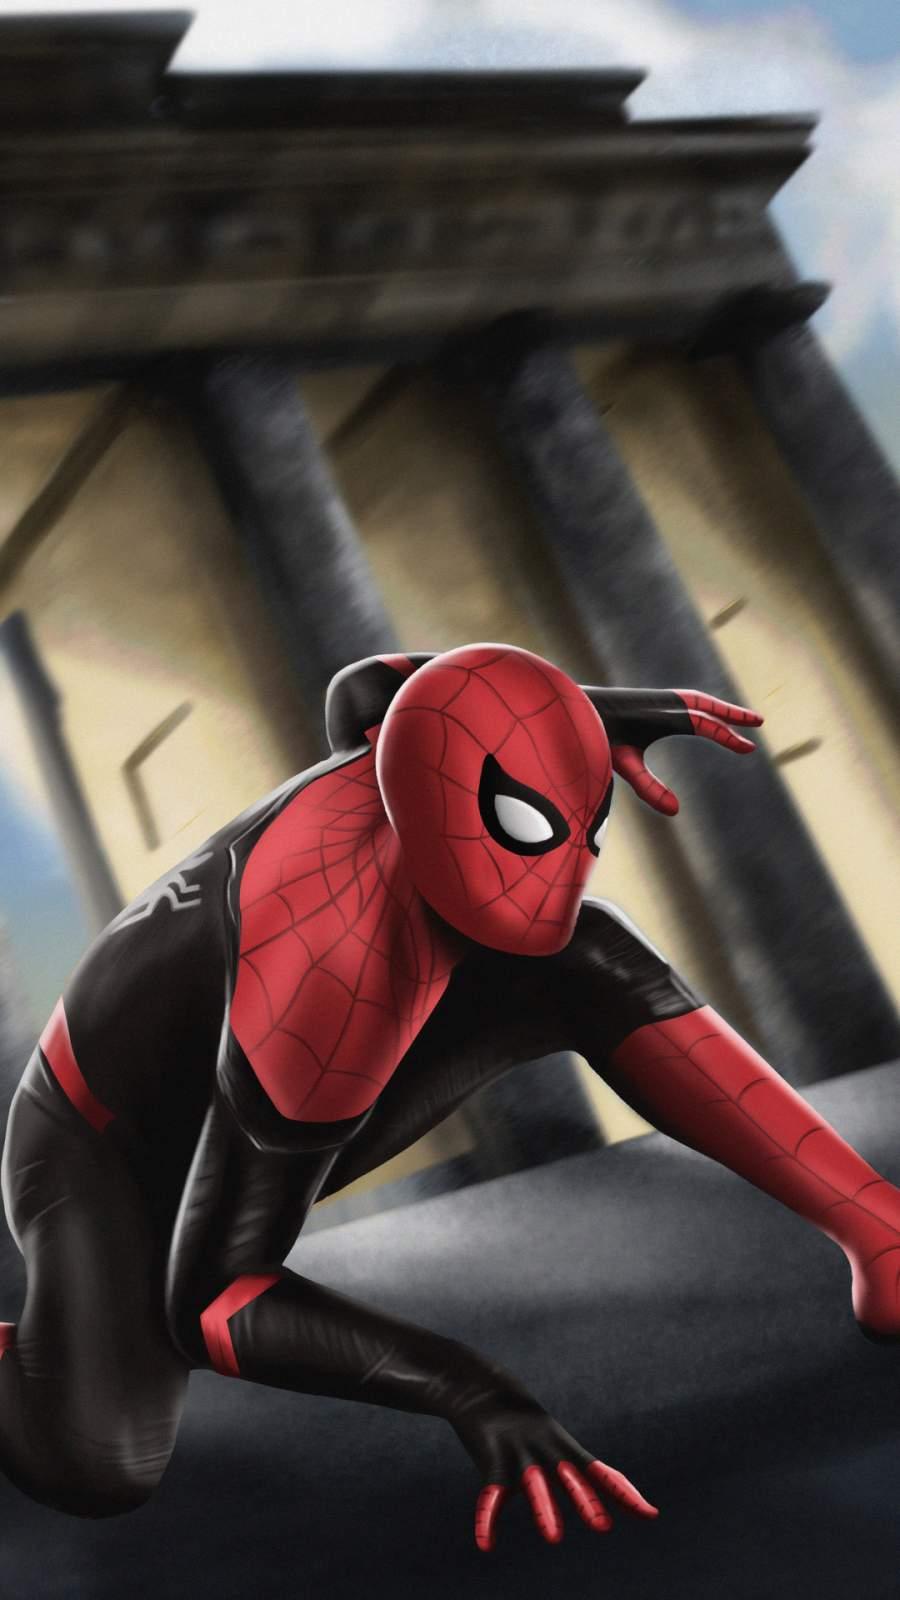 Spider Man Artwork iPhone Wallpaper